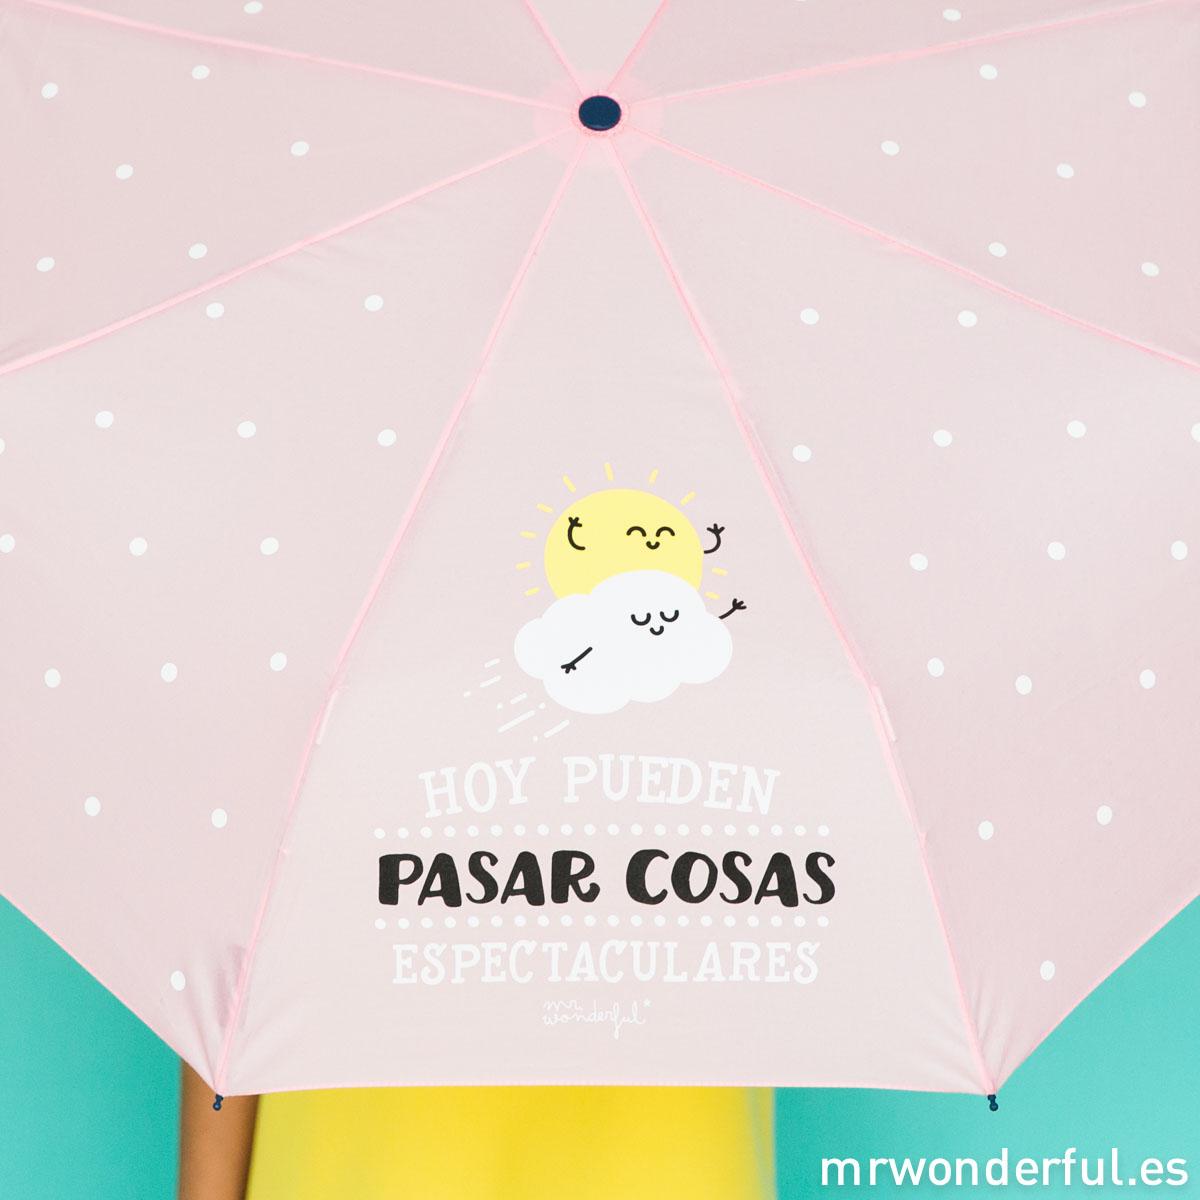 mrwonderful_8435460702867_WOA03178_paraguas_hoy-pueden-pasar-cosas-espectaculares_M_CAST-9